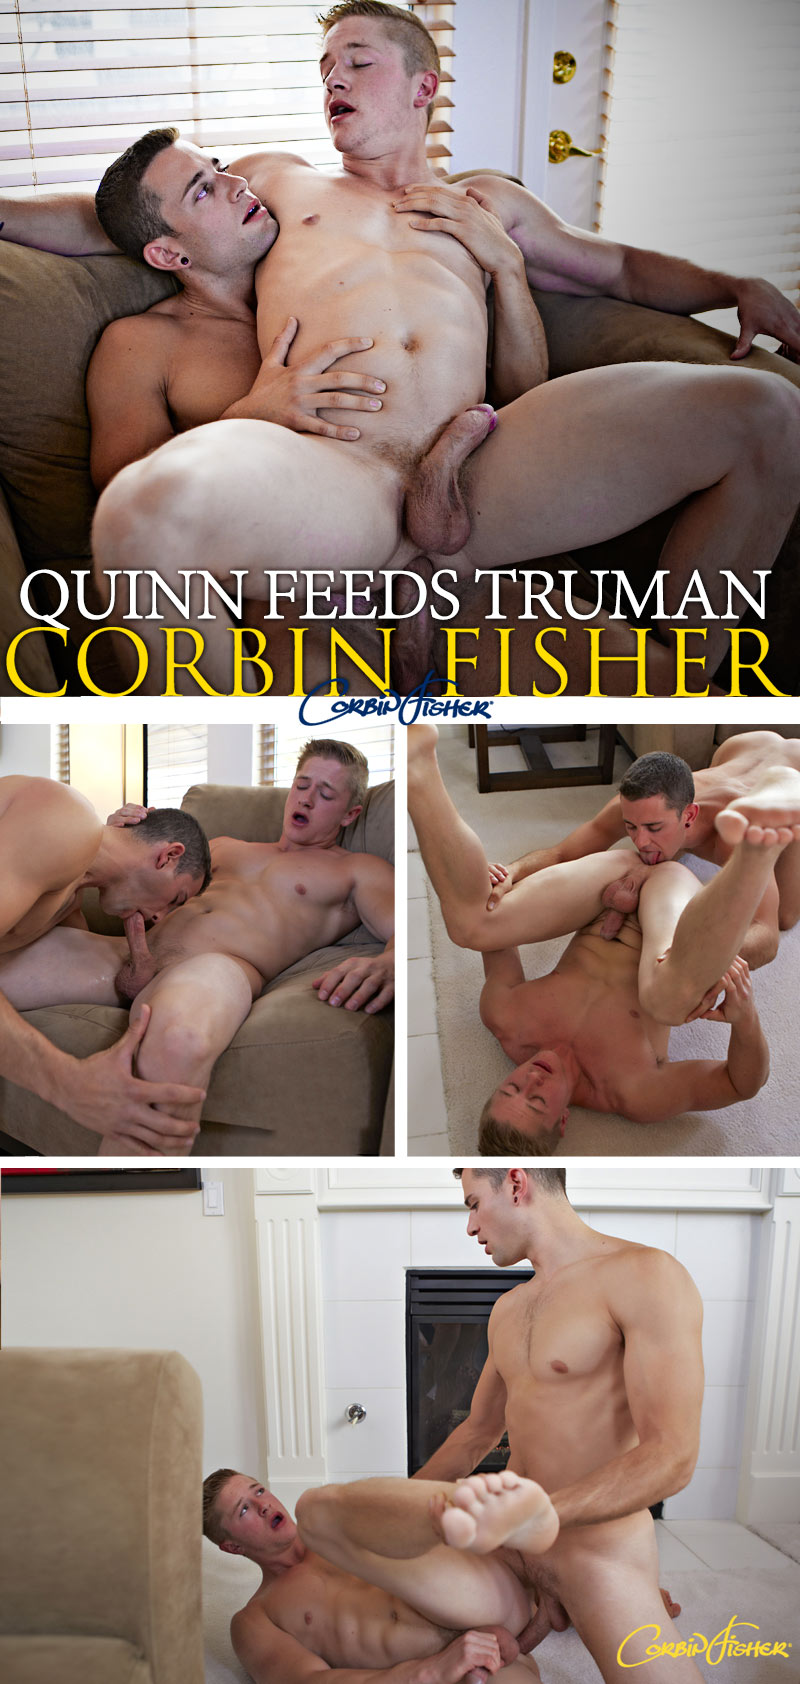 Quinn Feeds Truman (Bareback) at CorbinFisher